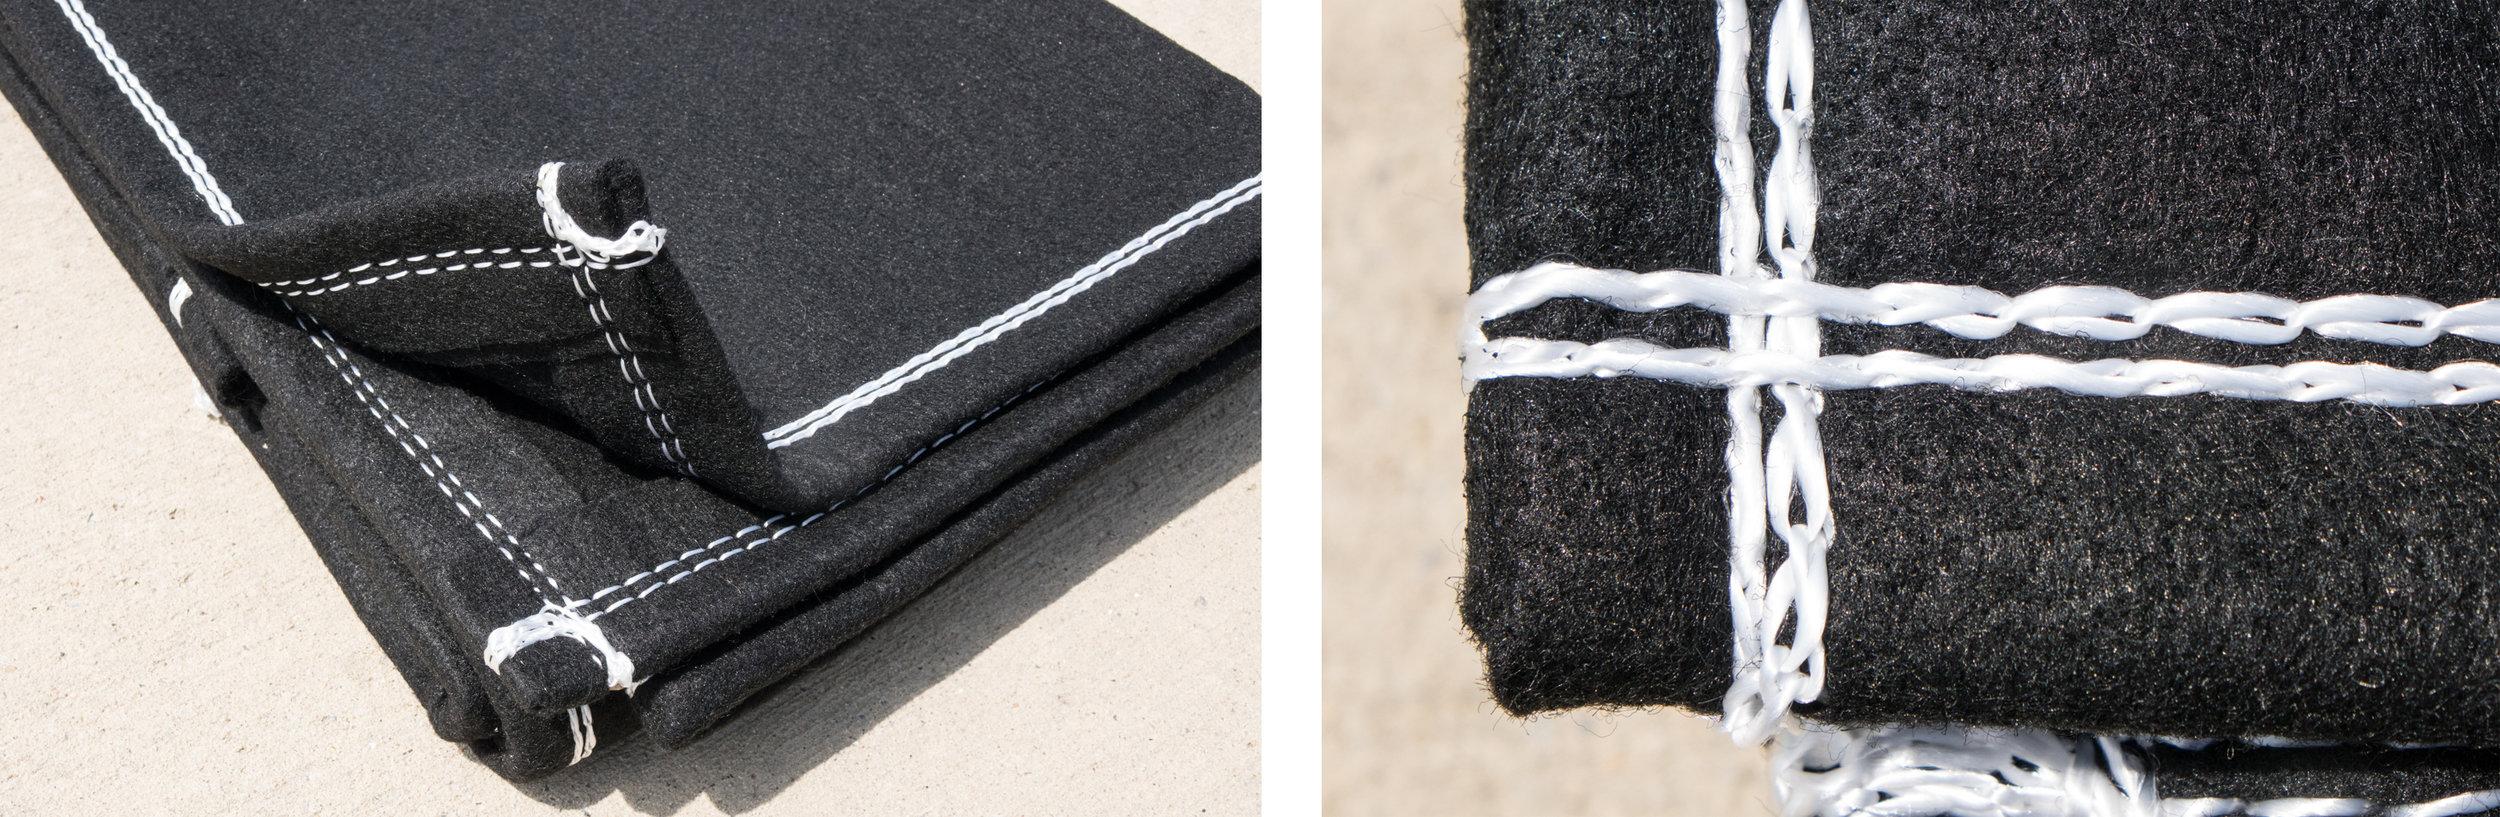 Dewatering Bag Filter Bag Silt Bag Dirt Bag Double Sewn Closeup